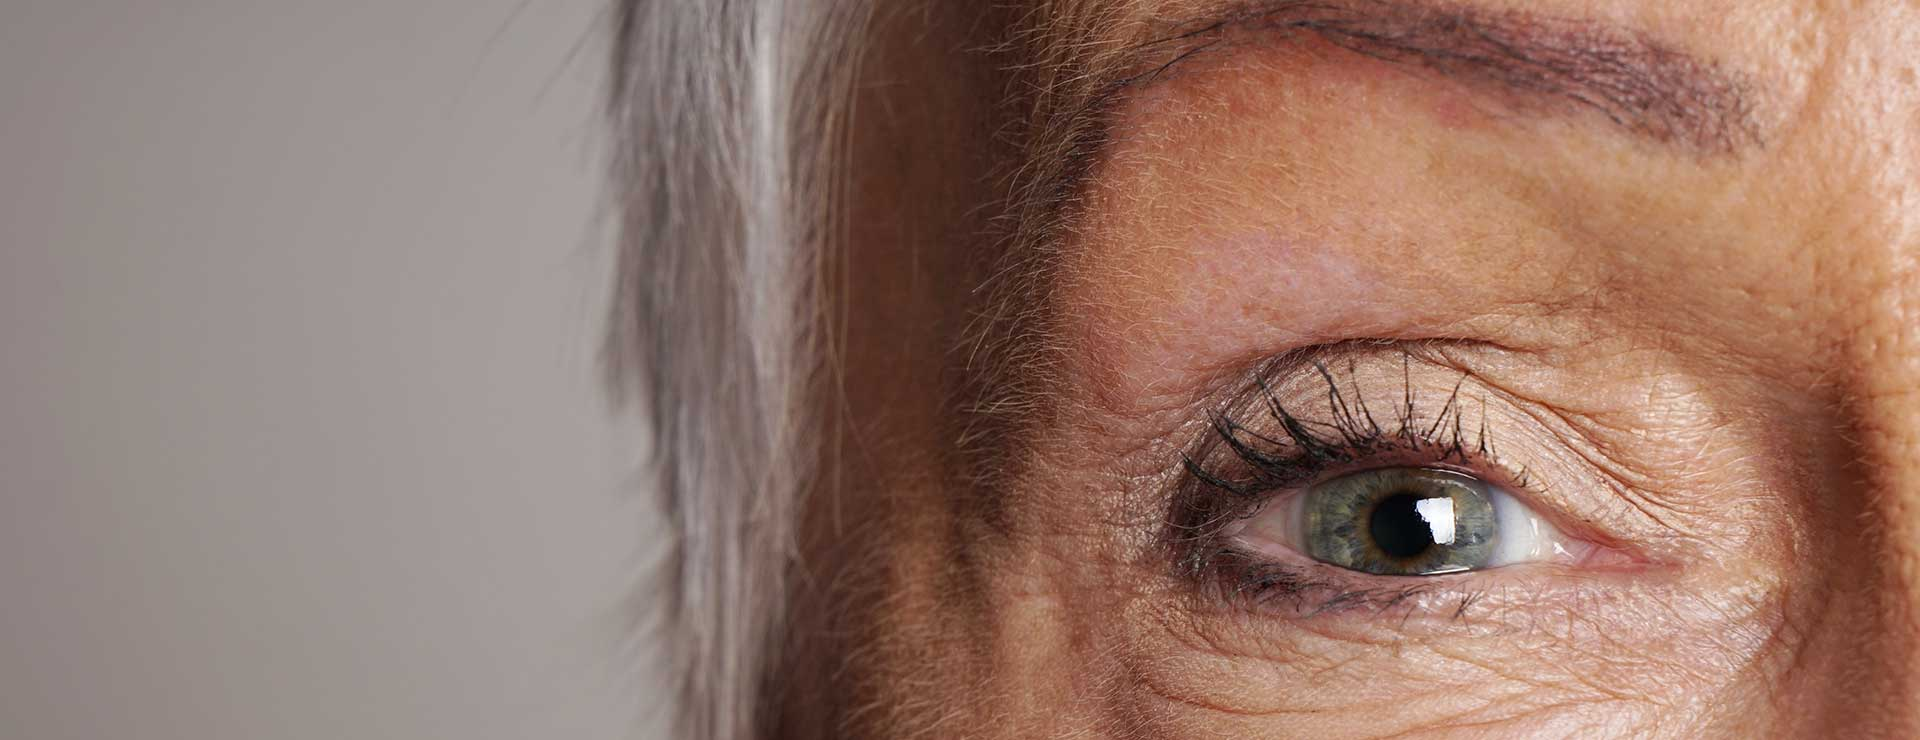 Optic Neuritis | Johns Hopkins Medicine